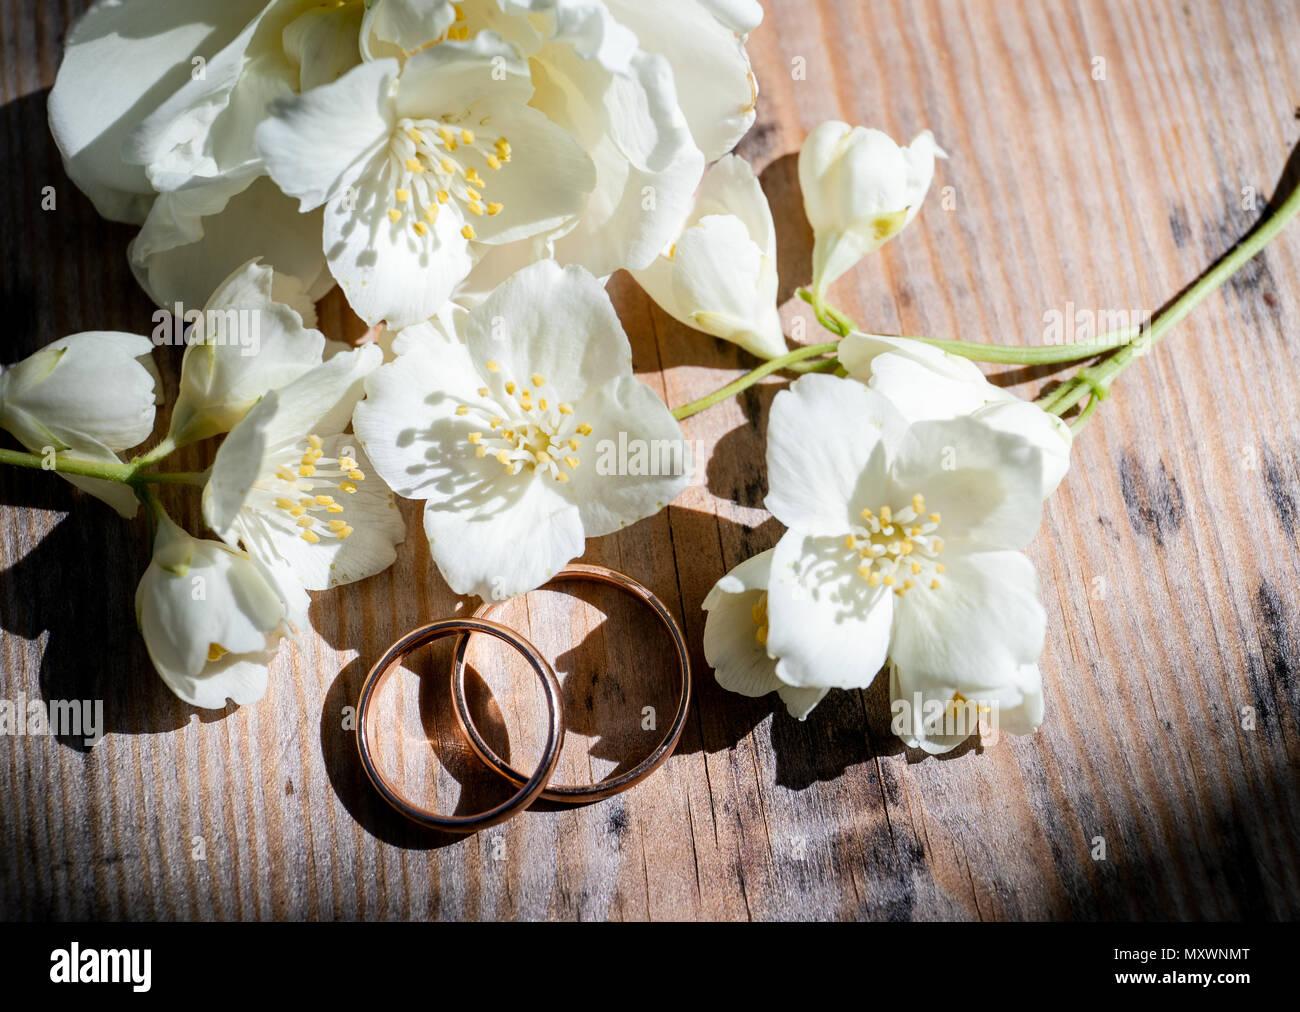 Golden wedding rings on white jasmine flowers stock photo 188650584 golden wedding rings on white jasmine flowers izmirmasajfo